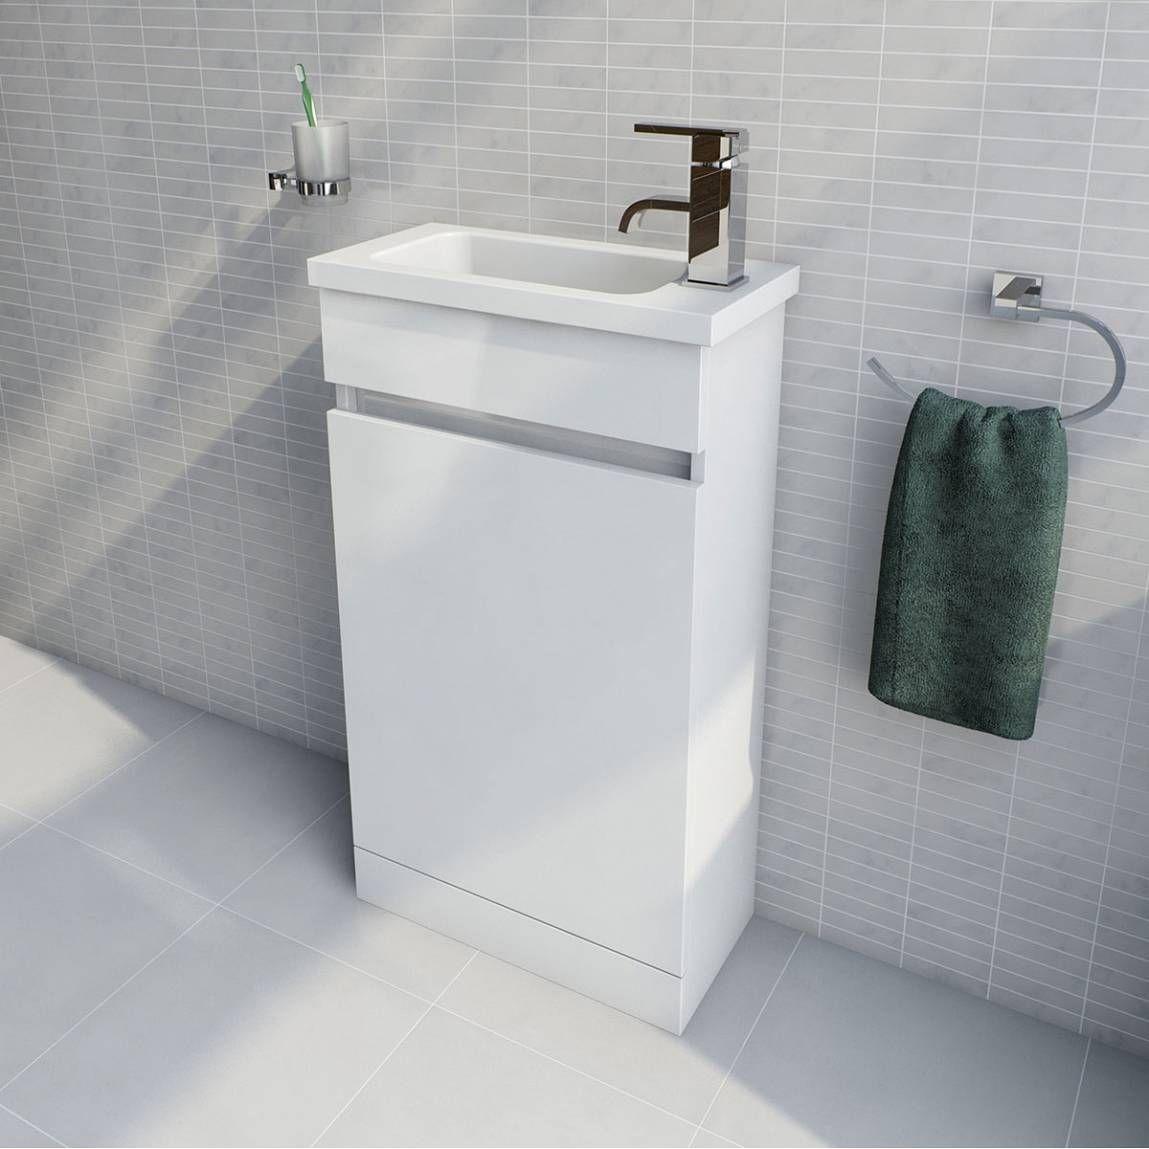 Sienna Autograph White Gloss Combination Vanity Unit Large Victoria Plumb Combination Vanity Units Vanity Units Bathroom